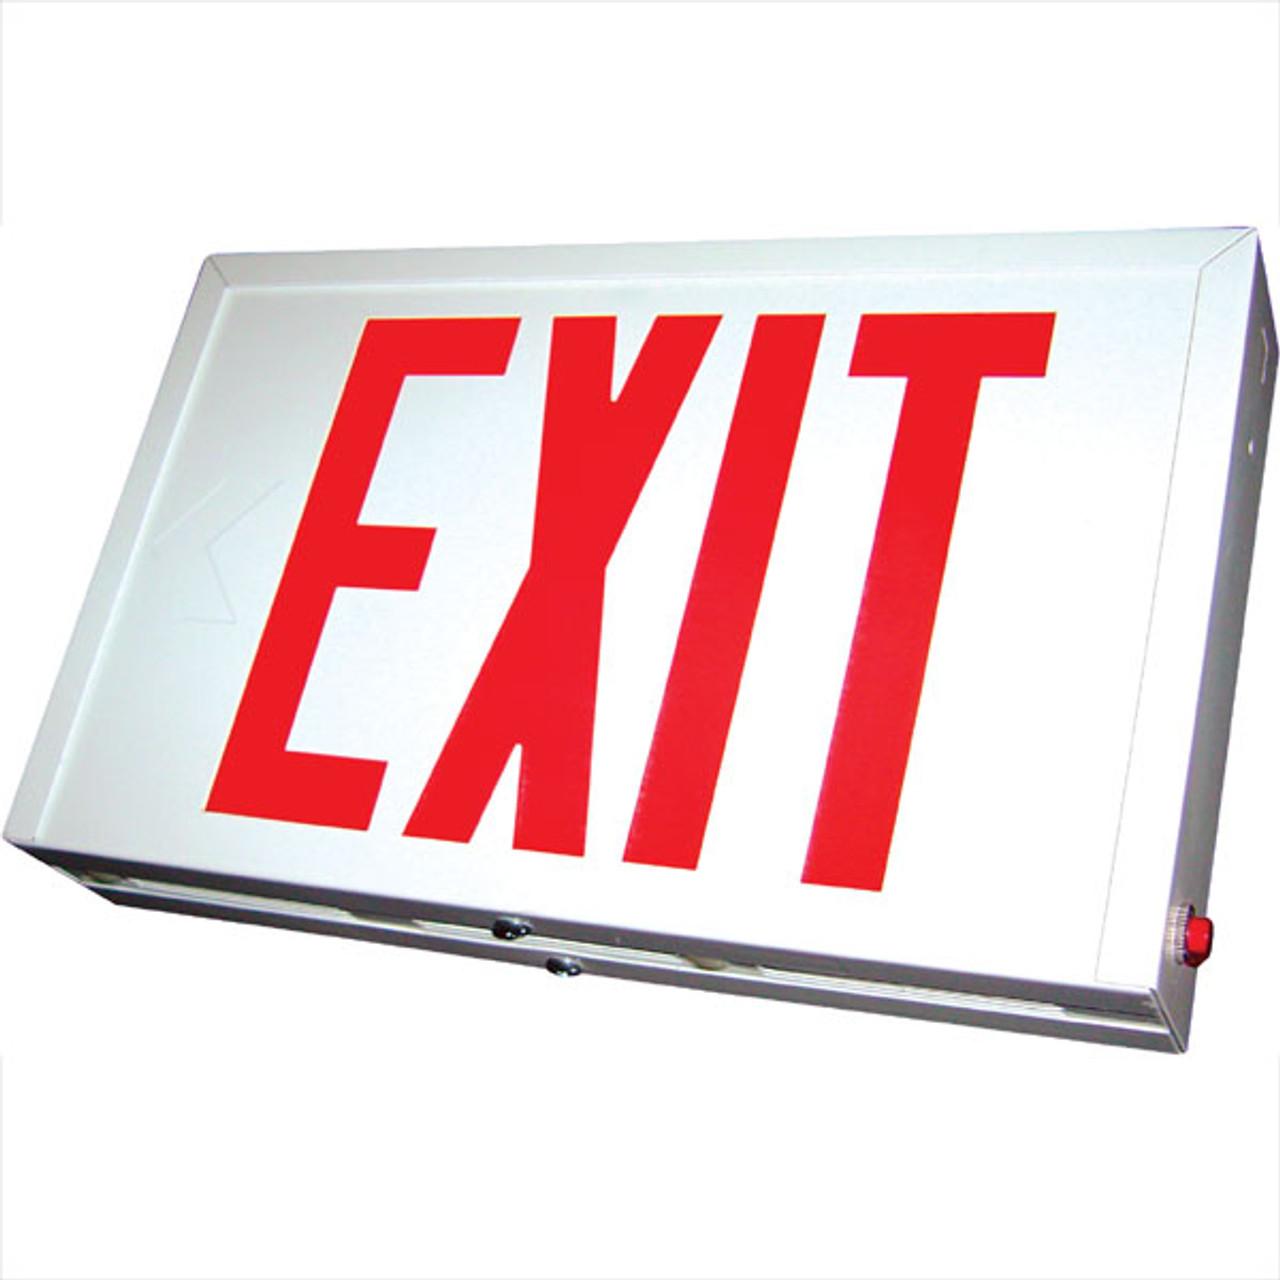 Chicago Steel Housing LED Exit Sign Battery Backup